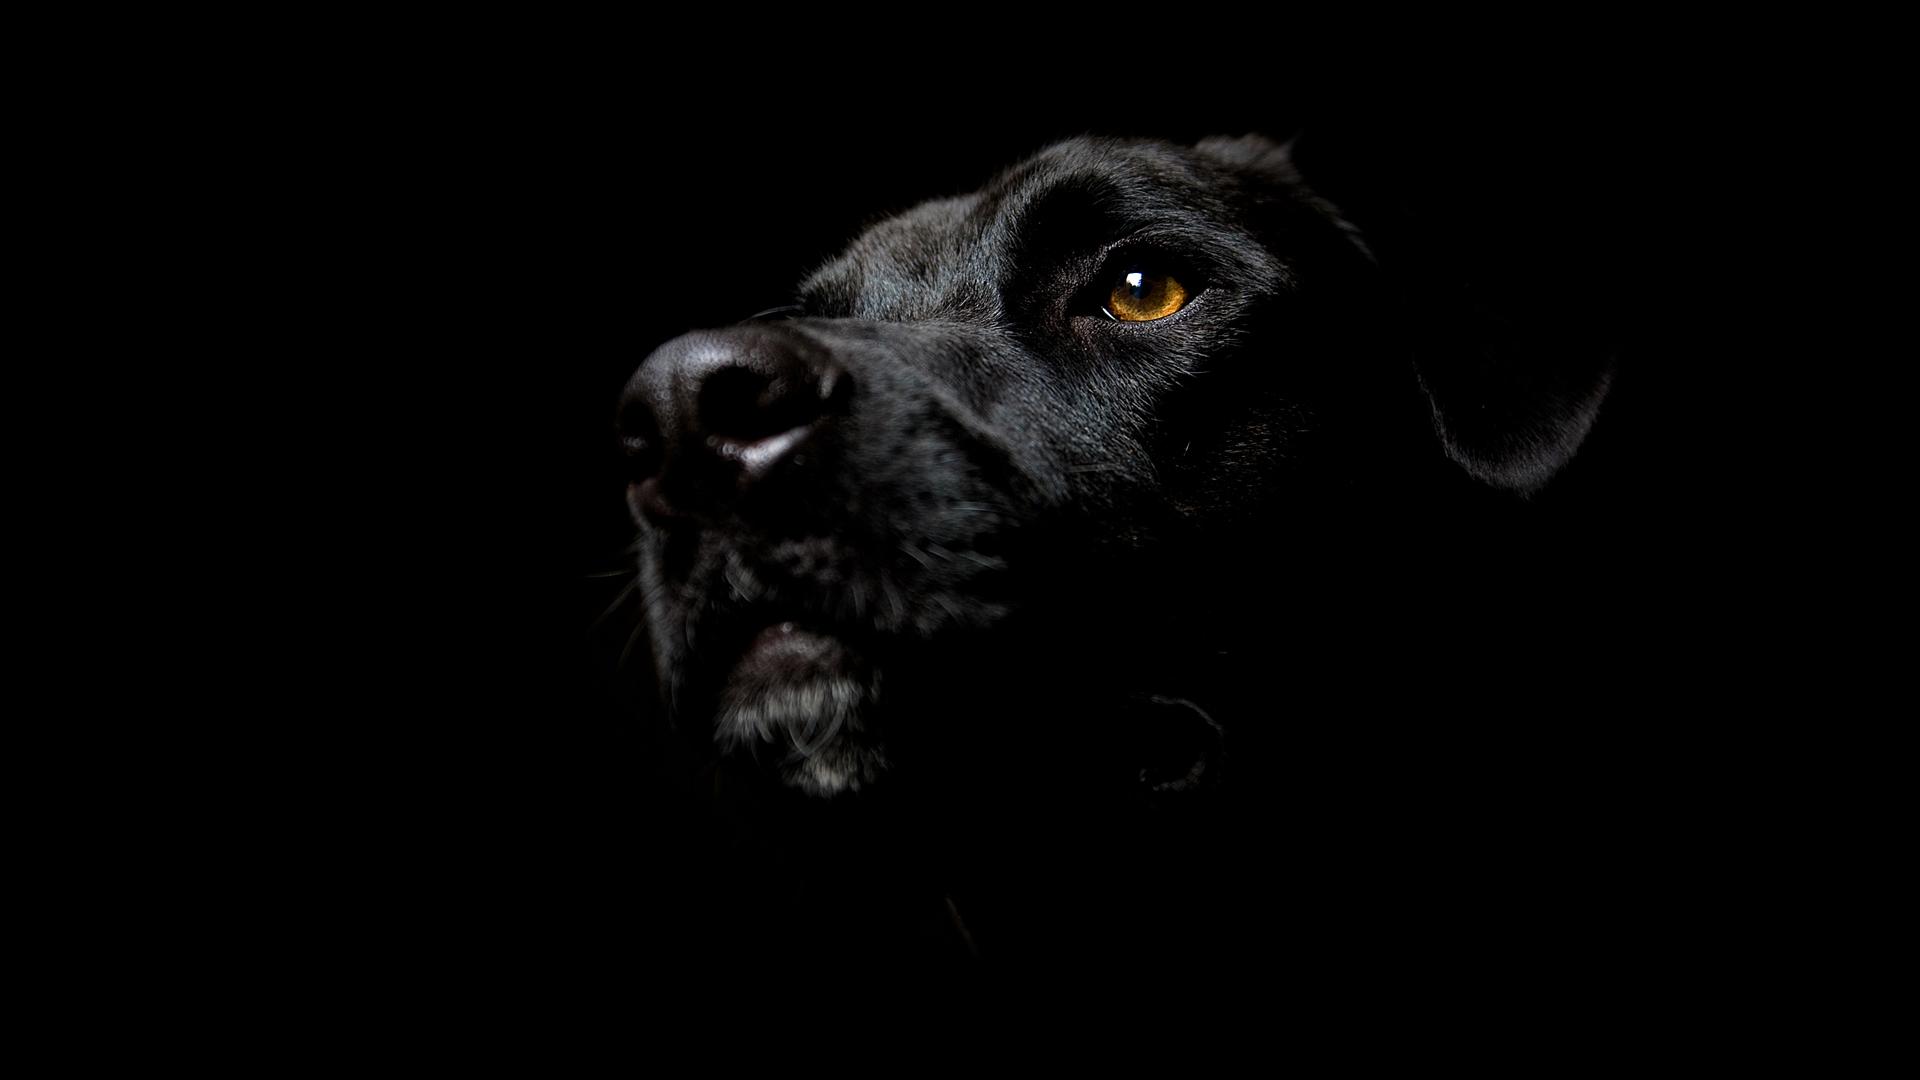 wallpaper black labrador cute backgrounds desktop dog 1920x1080